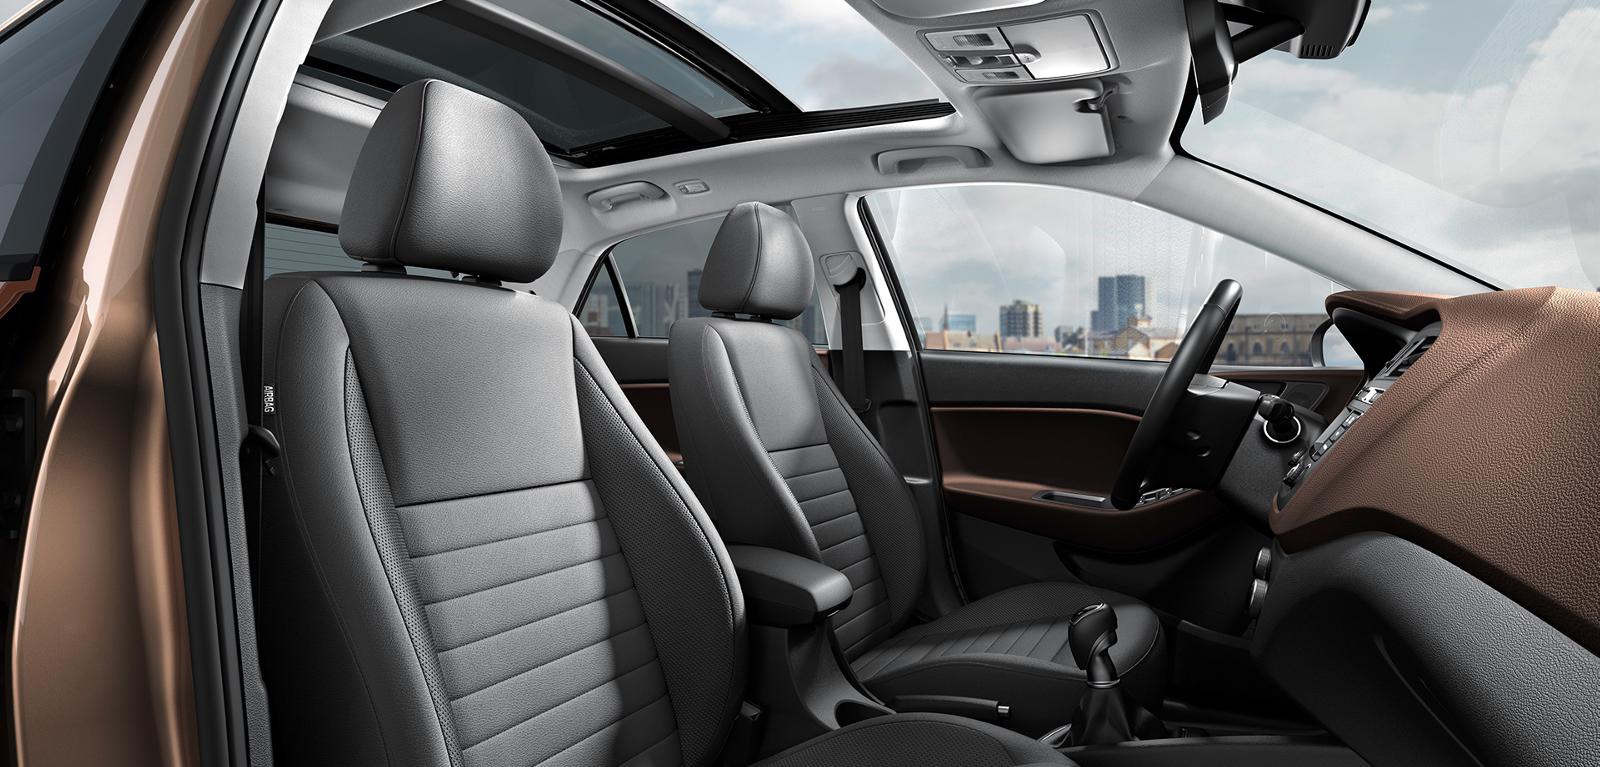 Interior Hyundai i20 con asientos negros